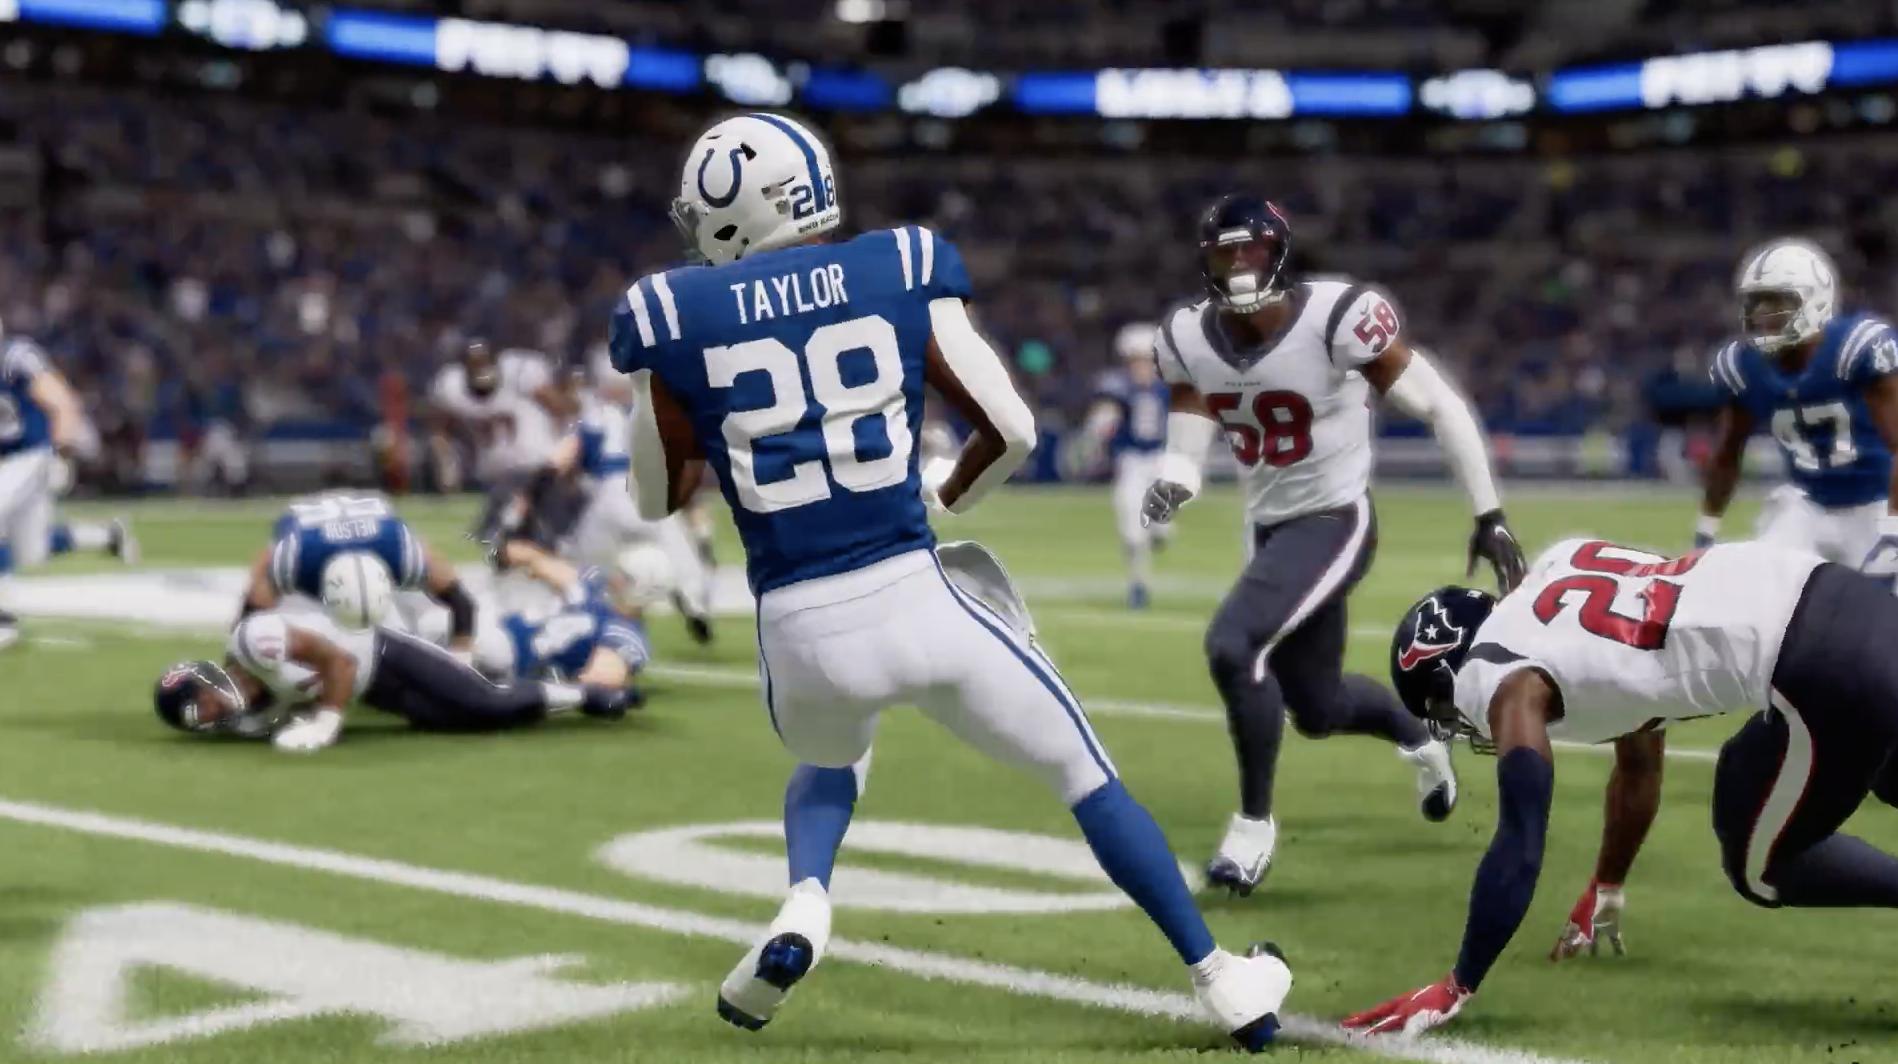 Madden NFL 22 Dynamic Gameday